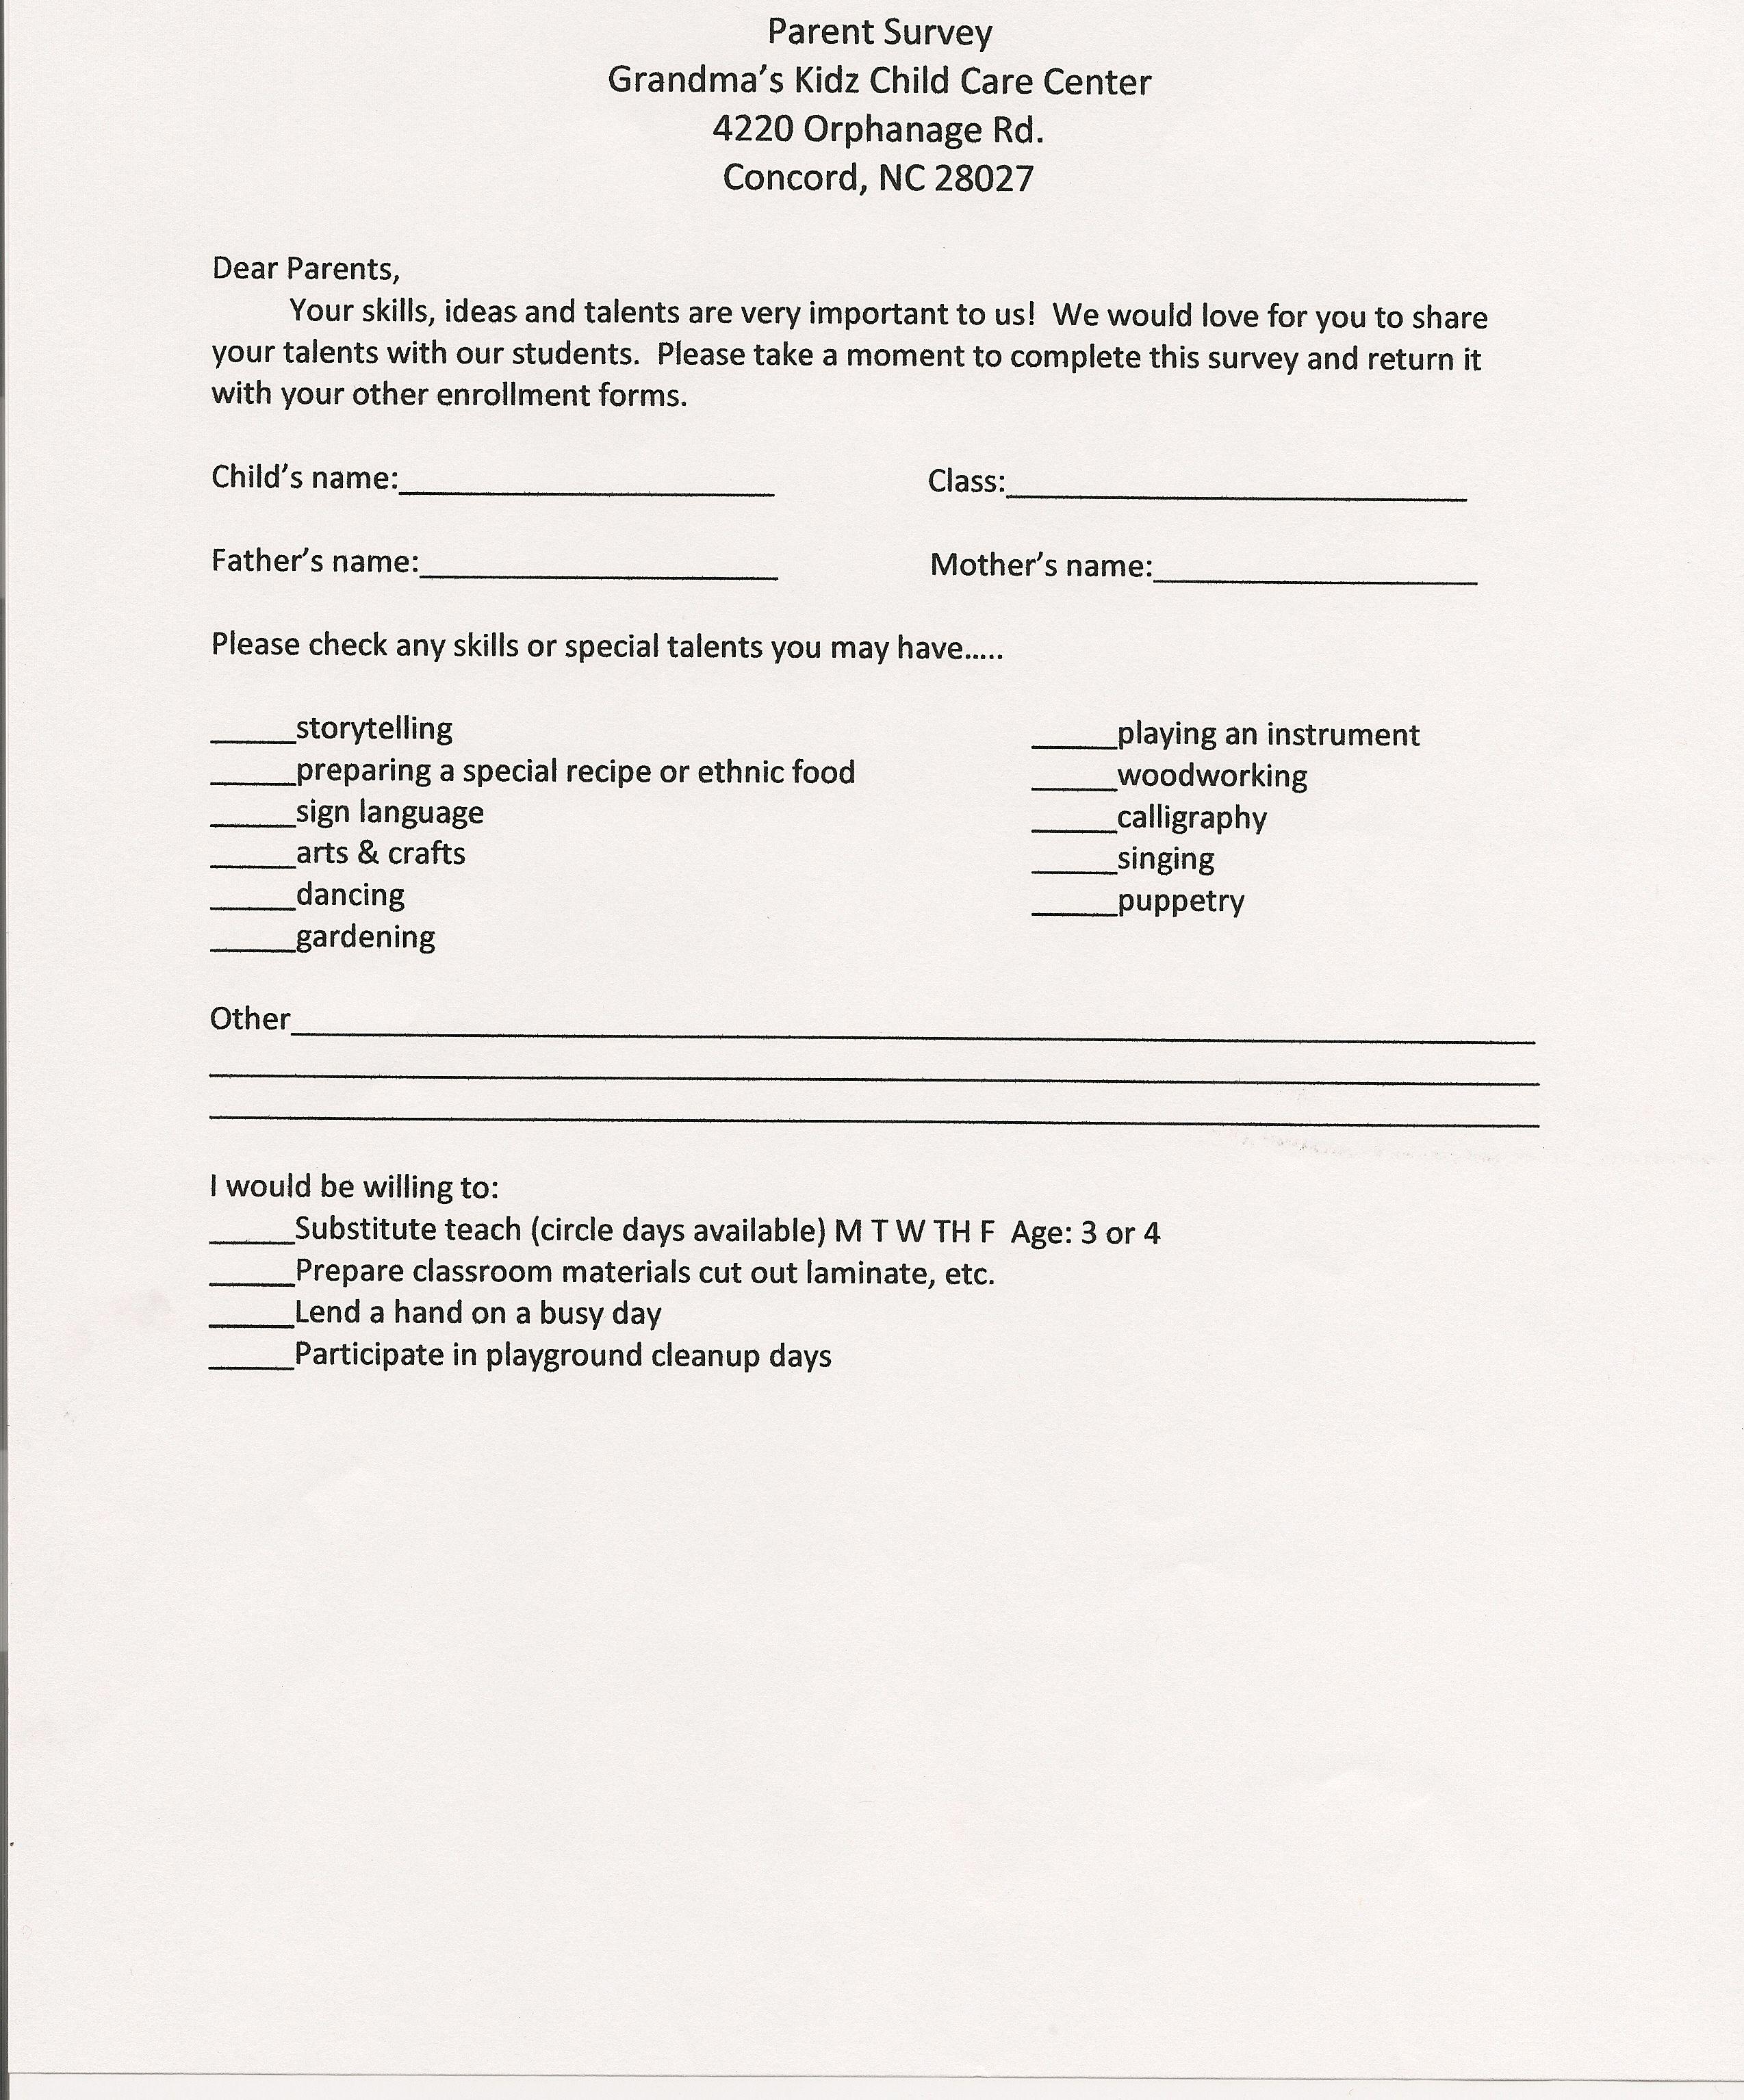 Parent Survey Forms Printable Prek